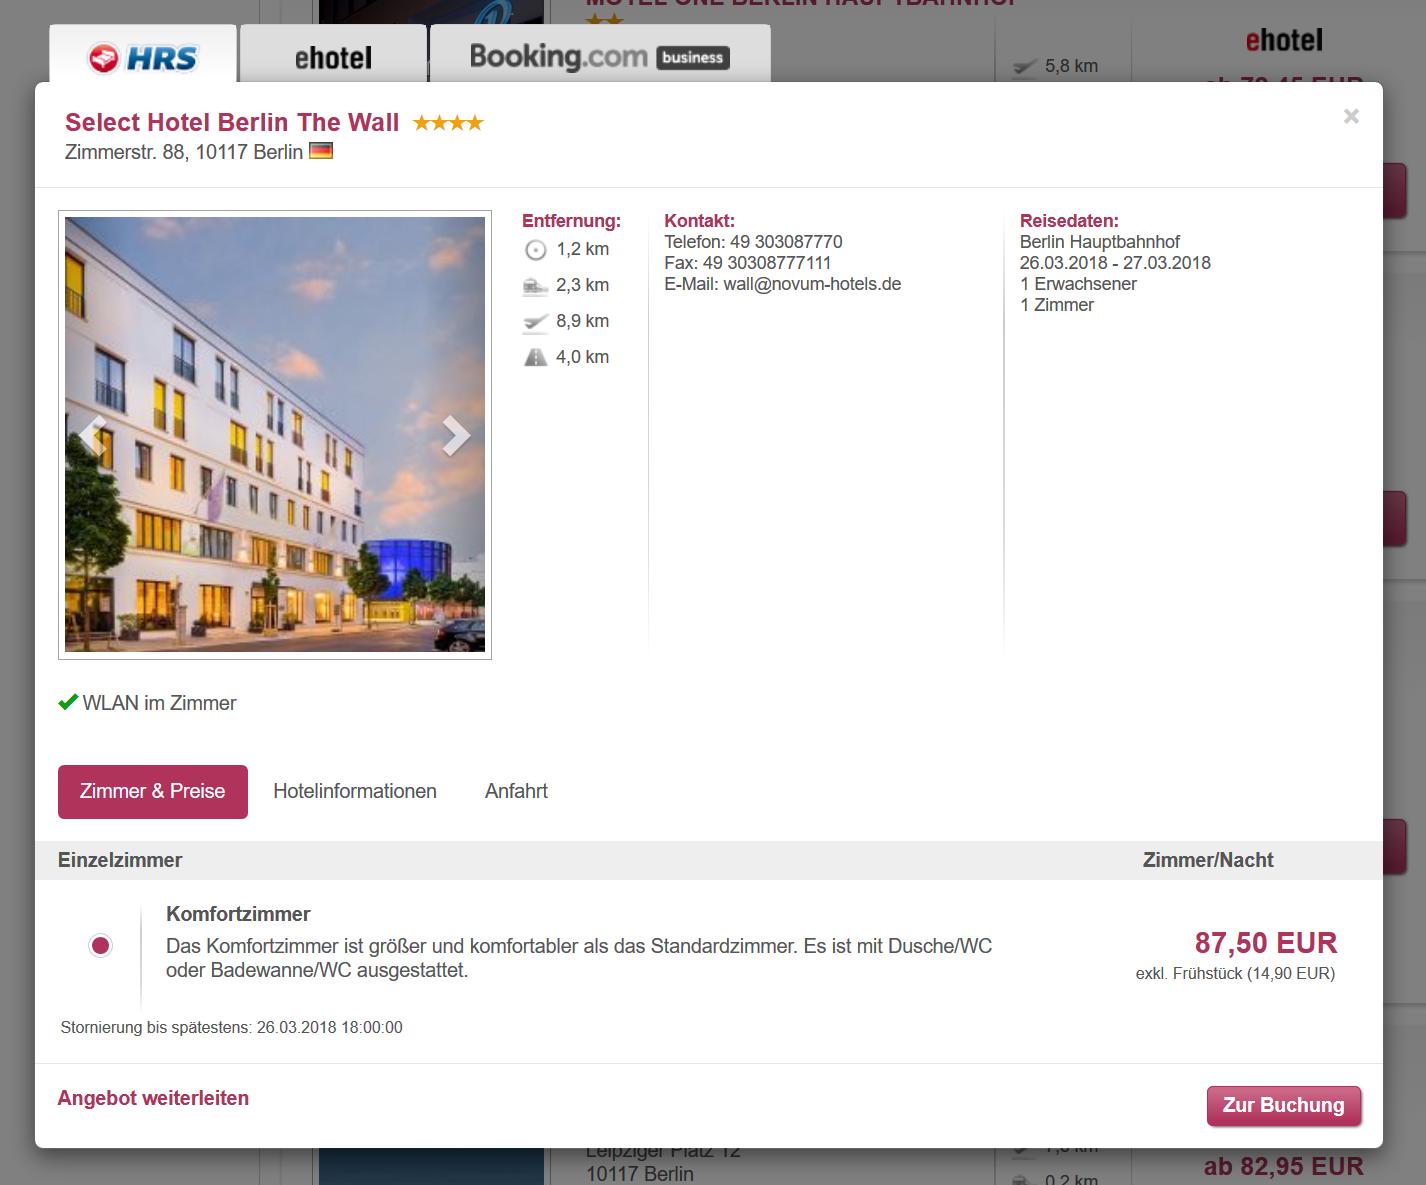 Hotelauswahl Und Buchung Atlatos Gmbh